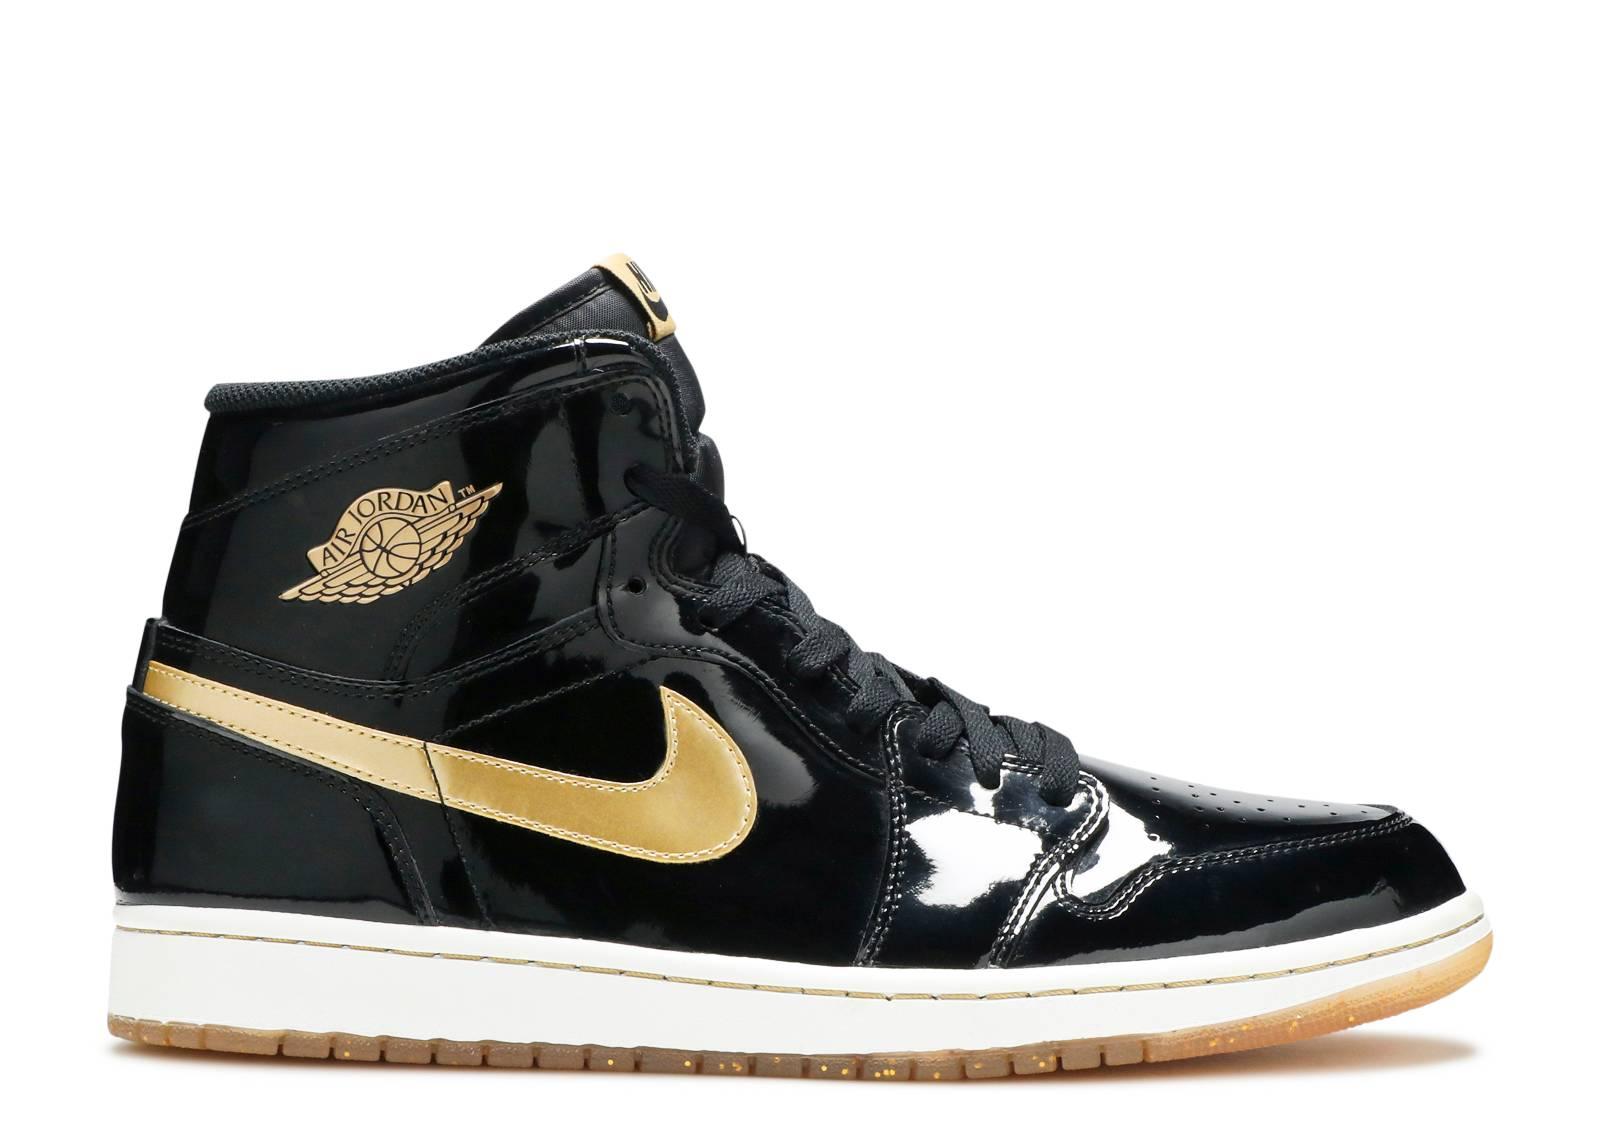 Air Jordan 1 Retro High OG 'Black Gold PL'